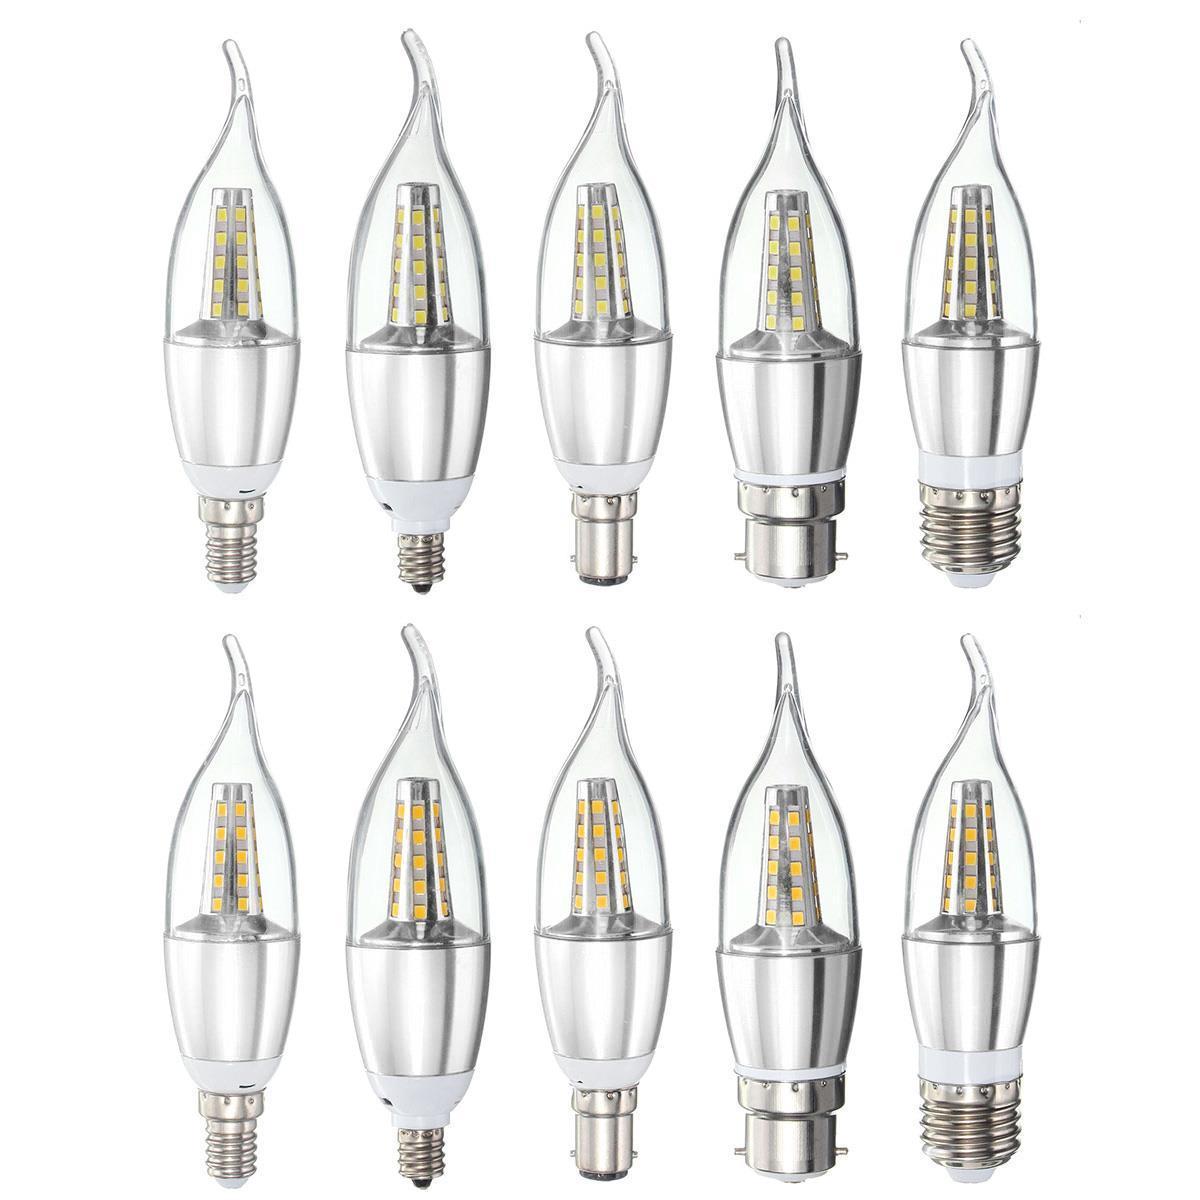 E27 E14 E12 B22 B15 6w 35 Smd Led Warm White White Candle Light Lamp Bulb Ac85 265v Sale